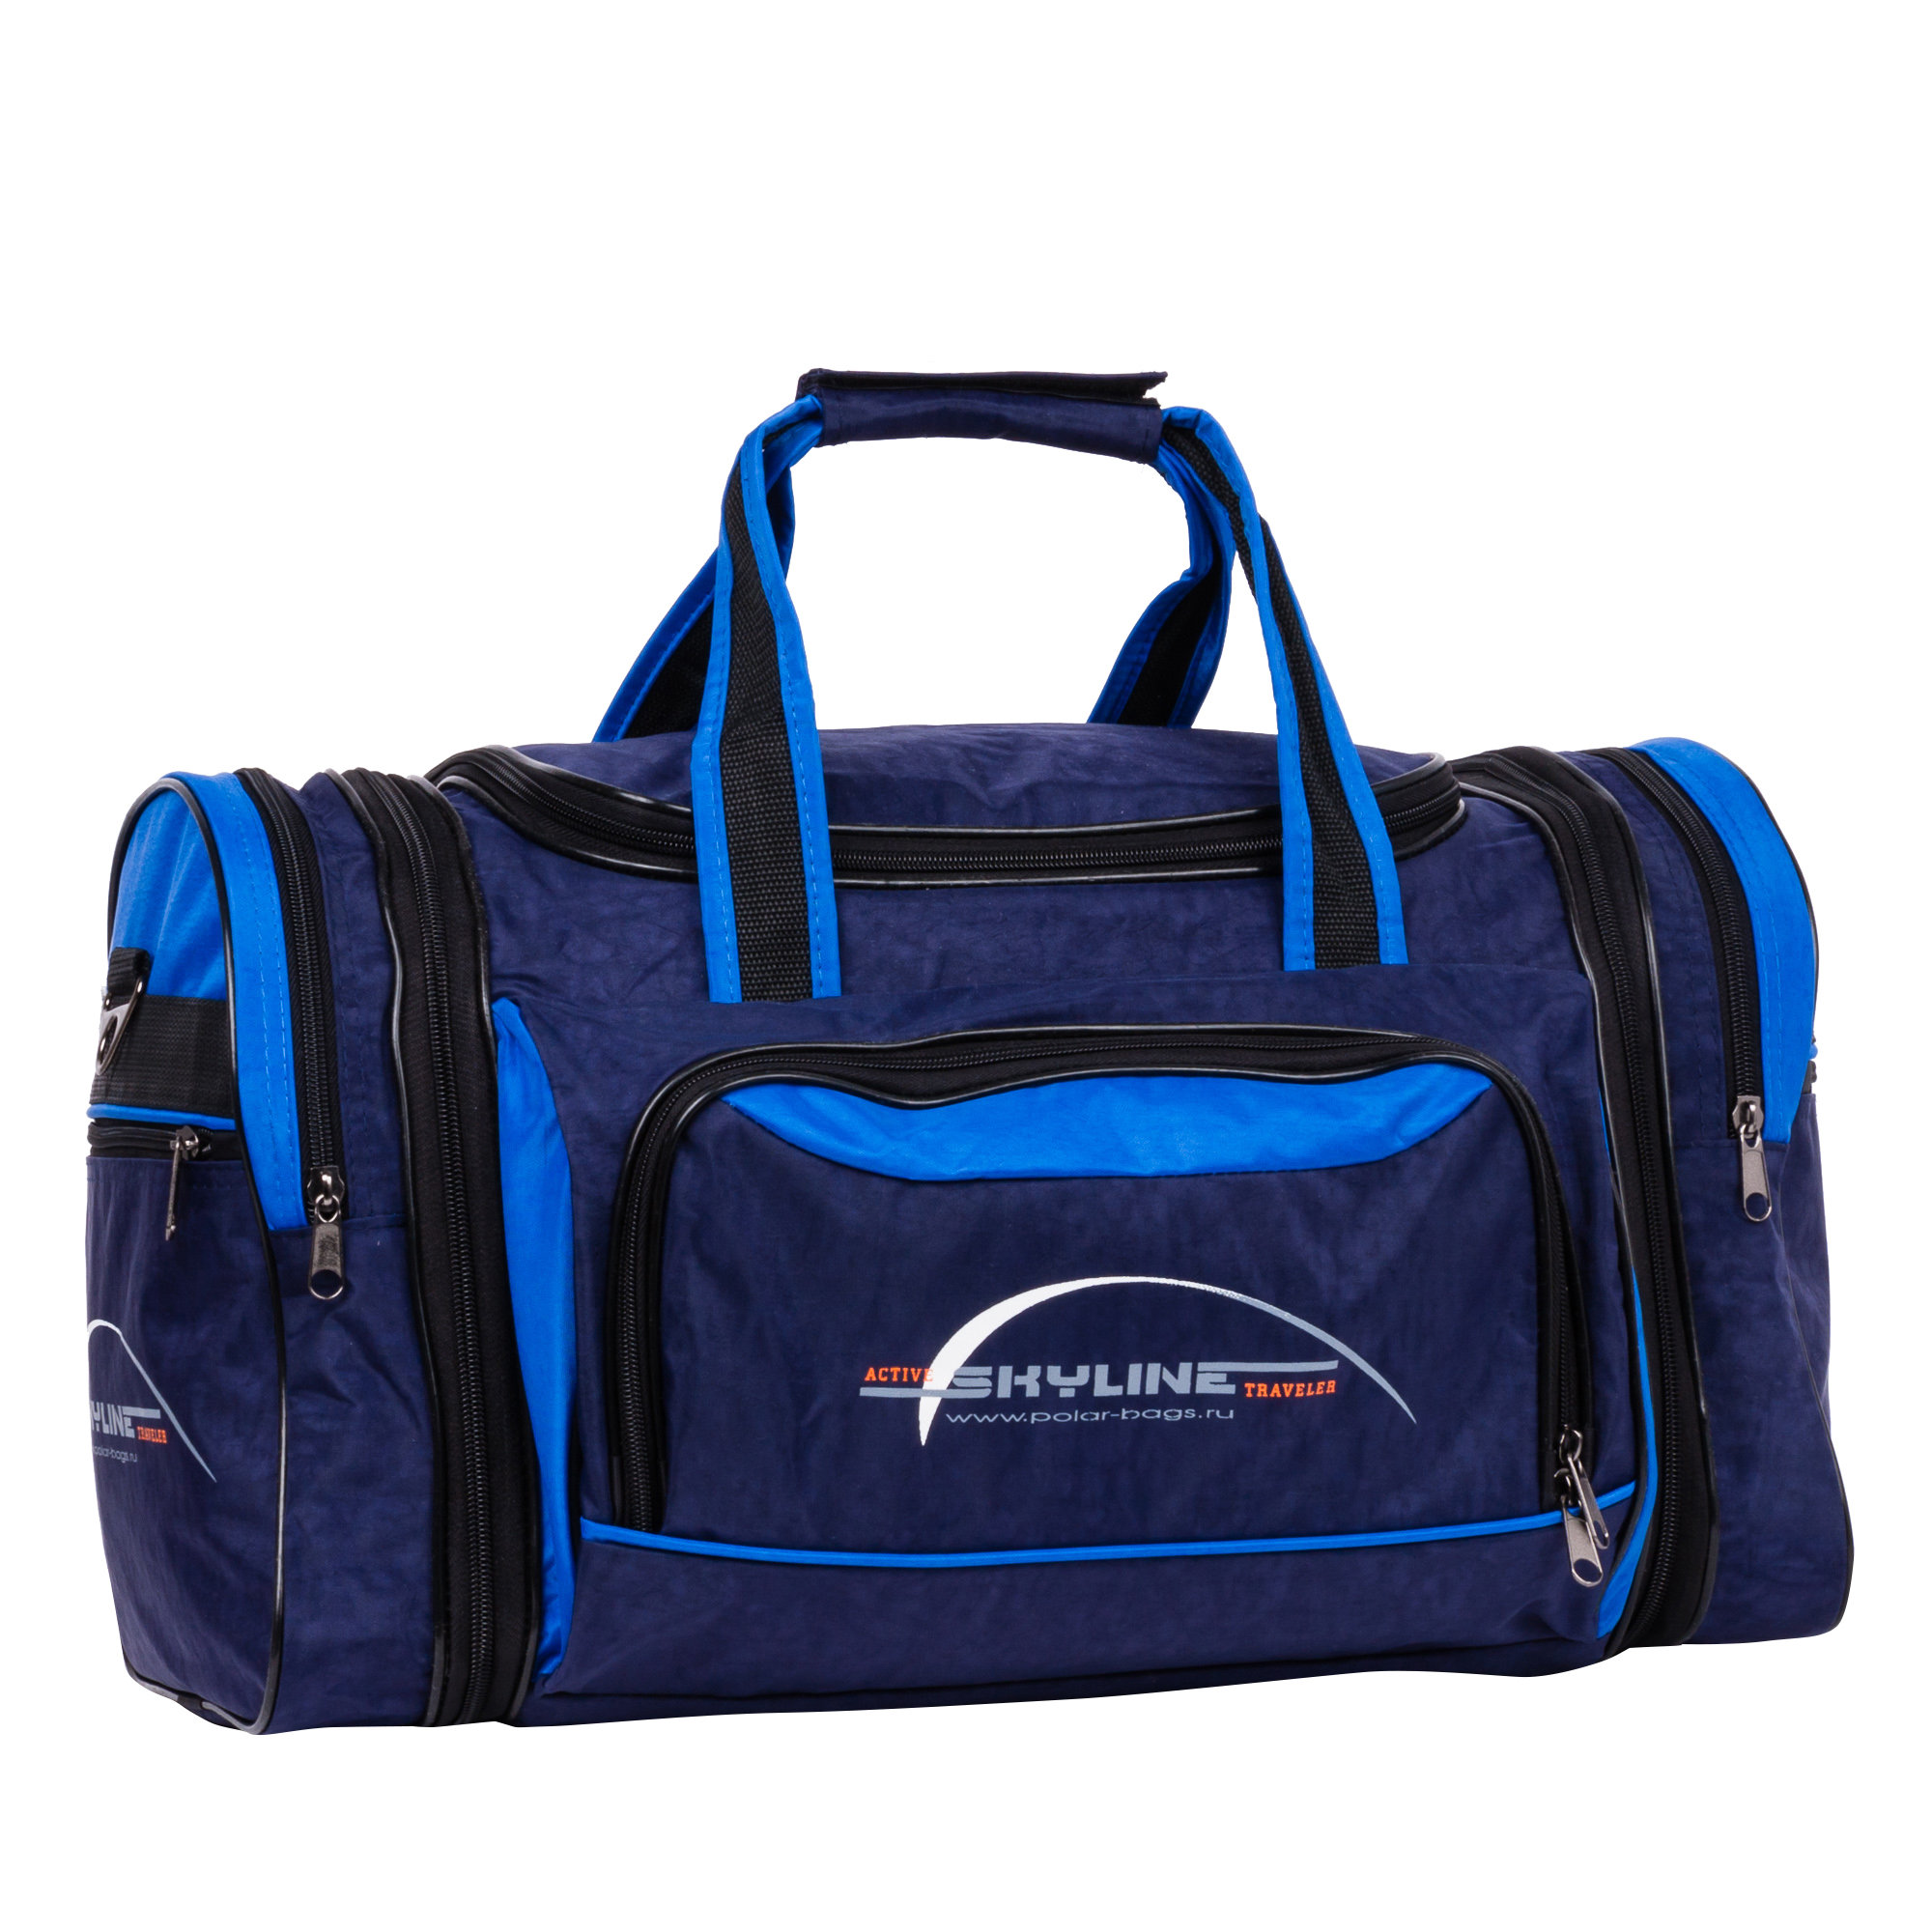 Спортивная сумка Polar 6067-1 38 голубой